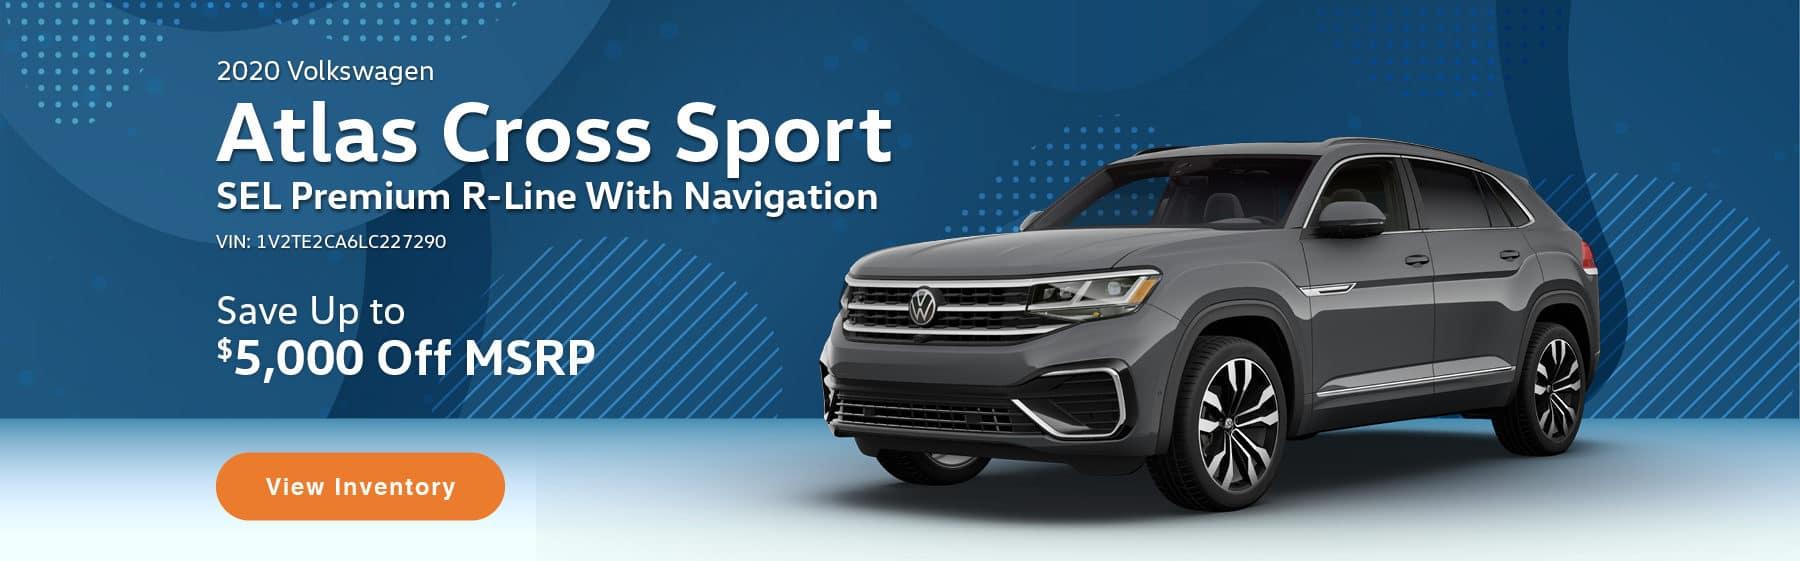 Save up to $5,000 off MSRP on the 2020 Atlas Cross Sport 3.6L V6 SEL Premium R-Line VIN#: 1V2TE2CA2LC225410.